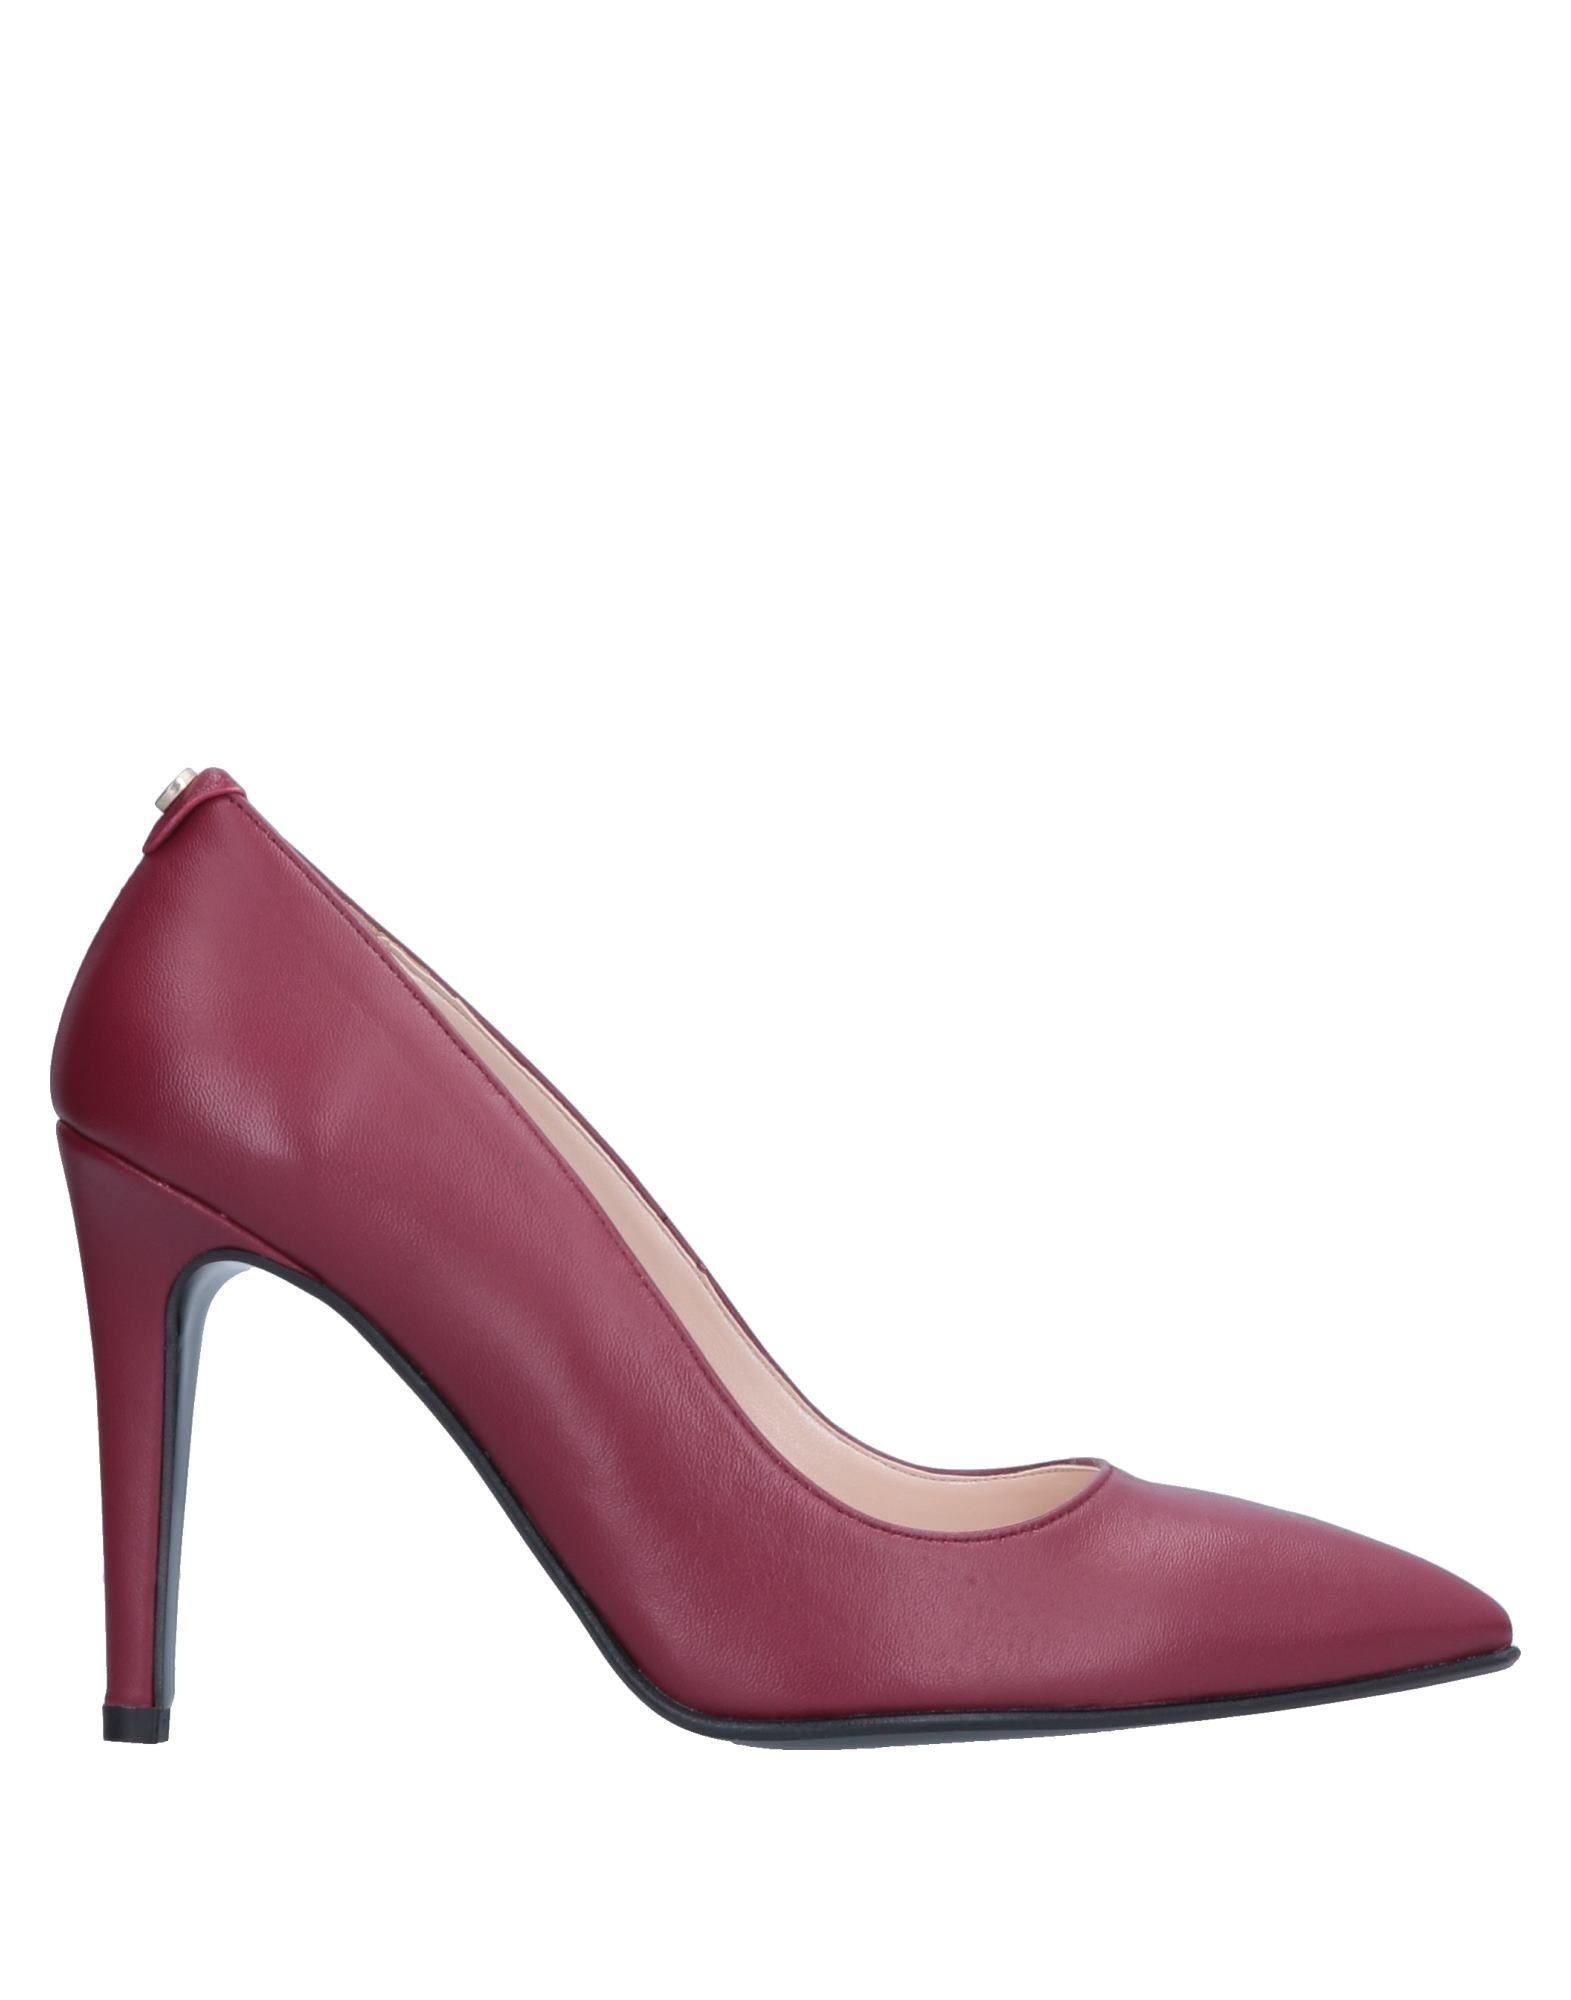 Trussardi Jeans Pumps Damen  11545906DG Gute Qualität beliebte Schuhe